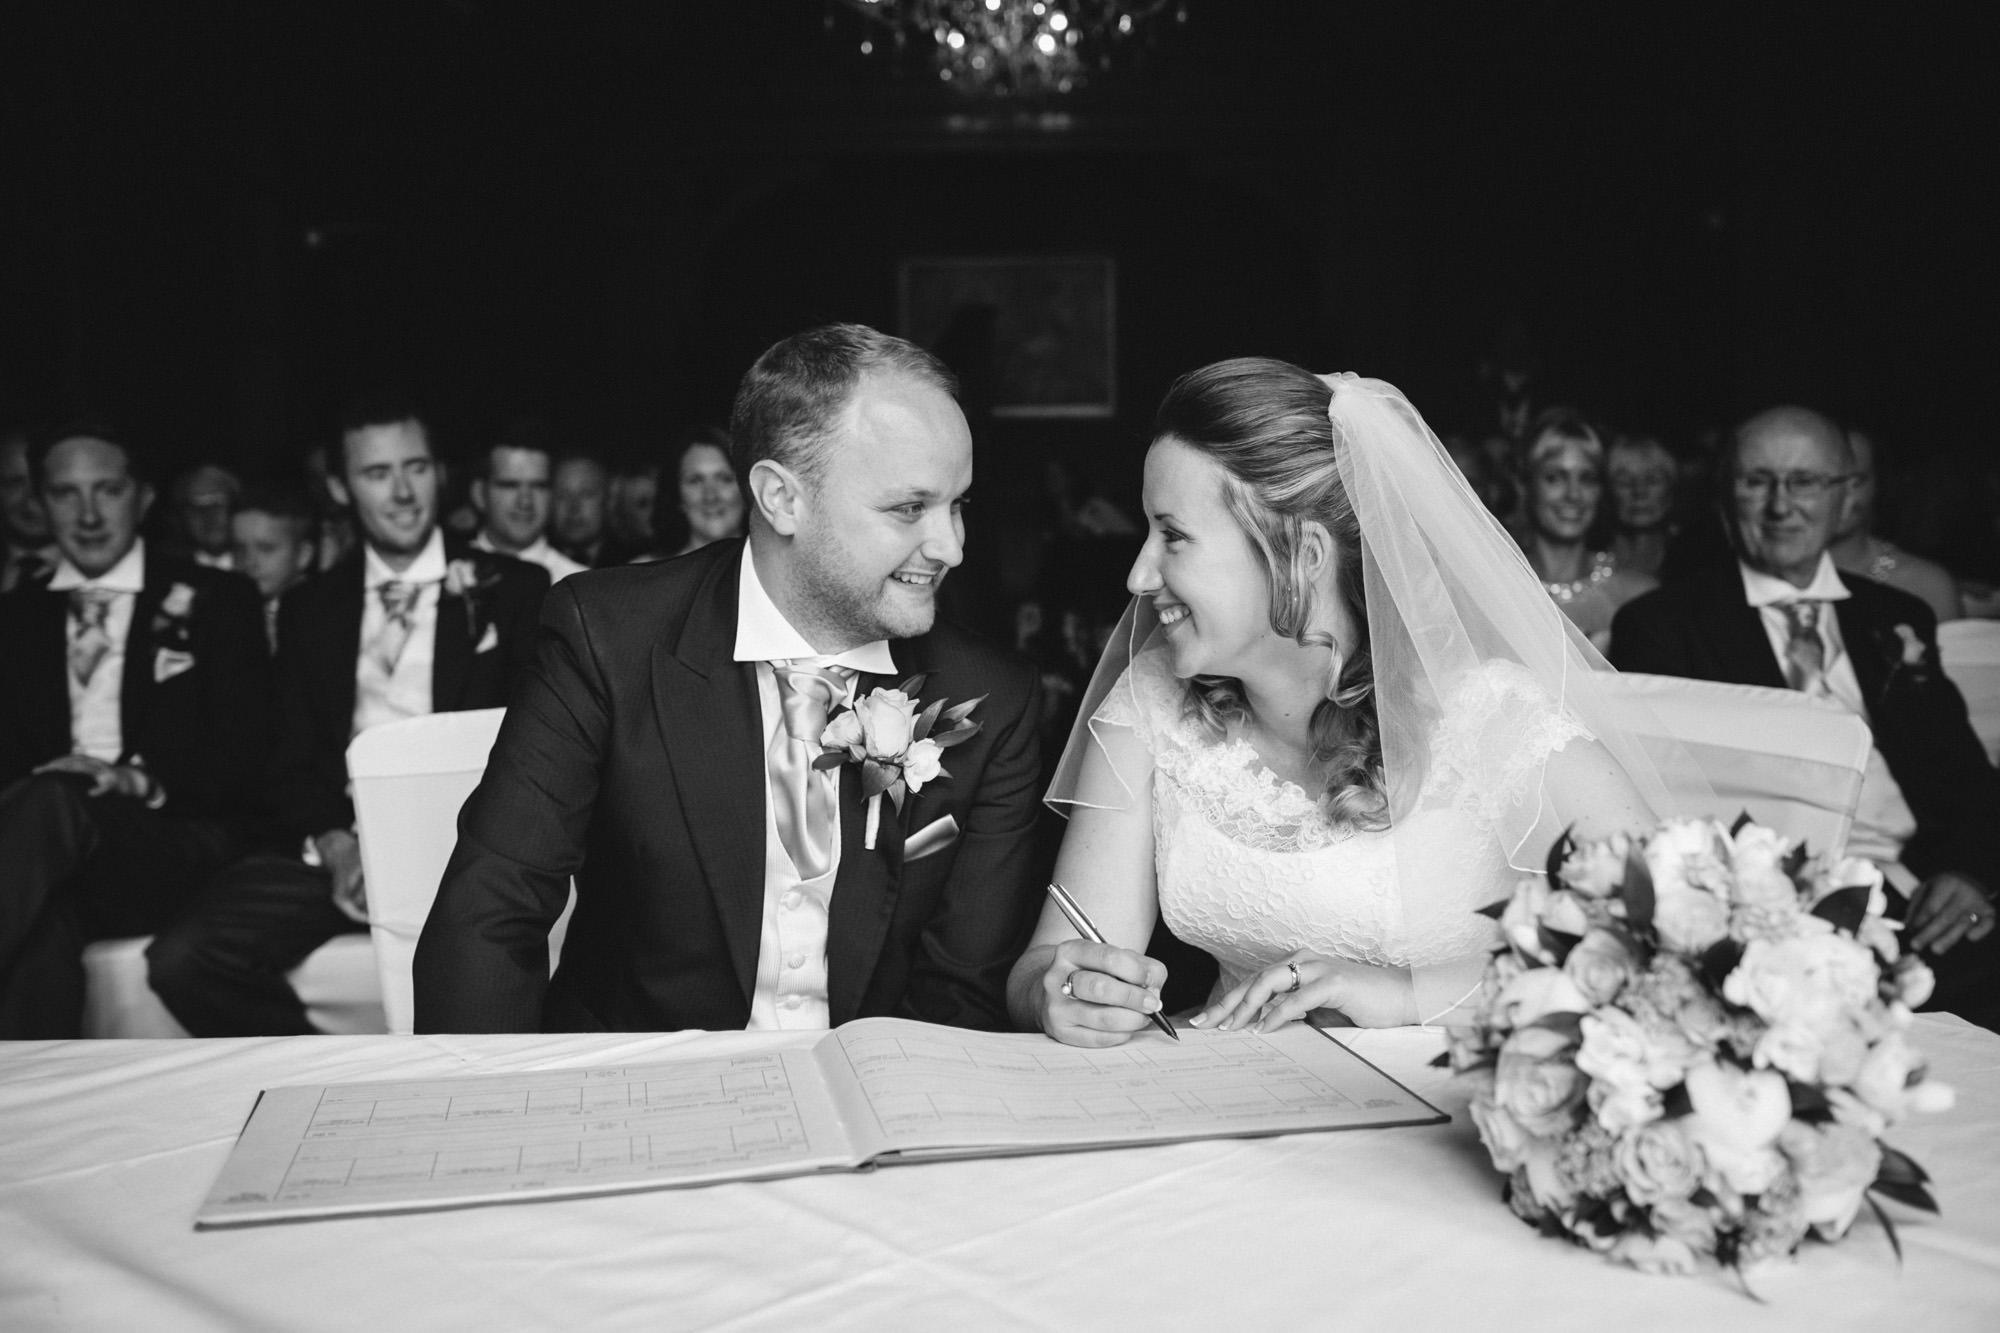 cambridge-wedding-photographer-io-1691-193.jpg